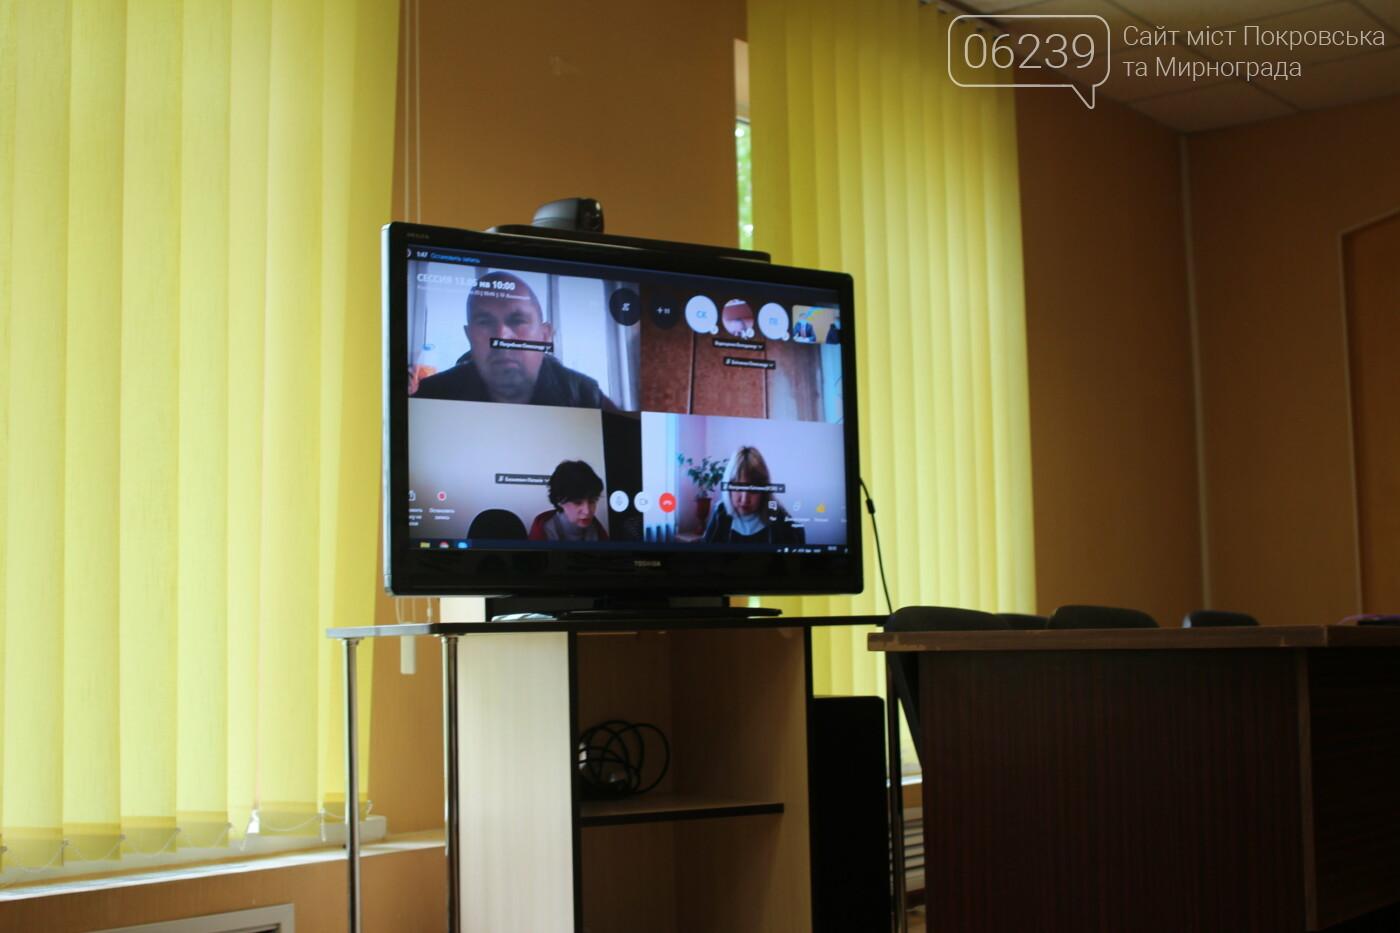 В Мирнограде сессия горсовета снова проходила в онлайн-режиме (вопросы повестки дня), фото-4